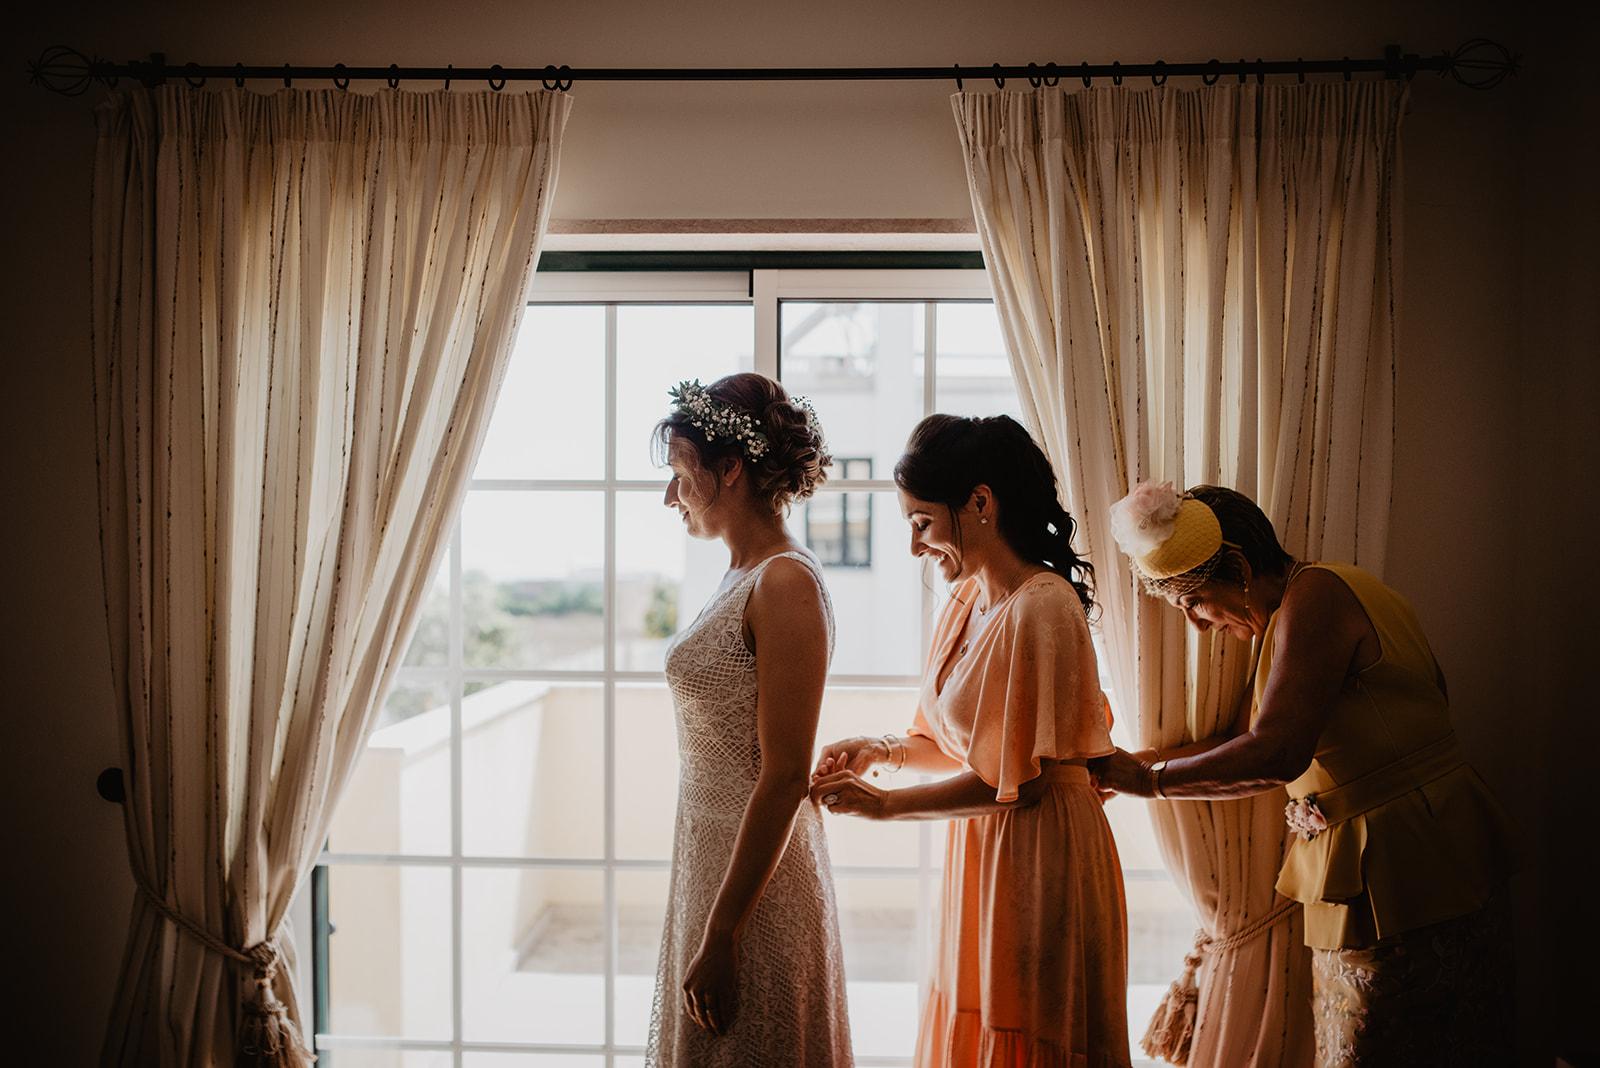 Lapela-photography-wedding-algarve-portugal-best-of-111.jpg